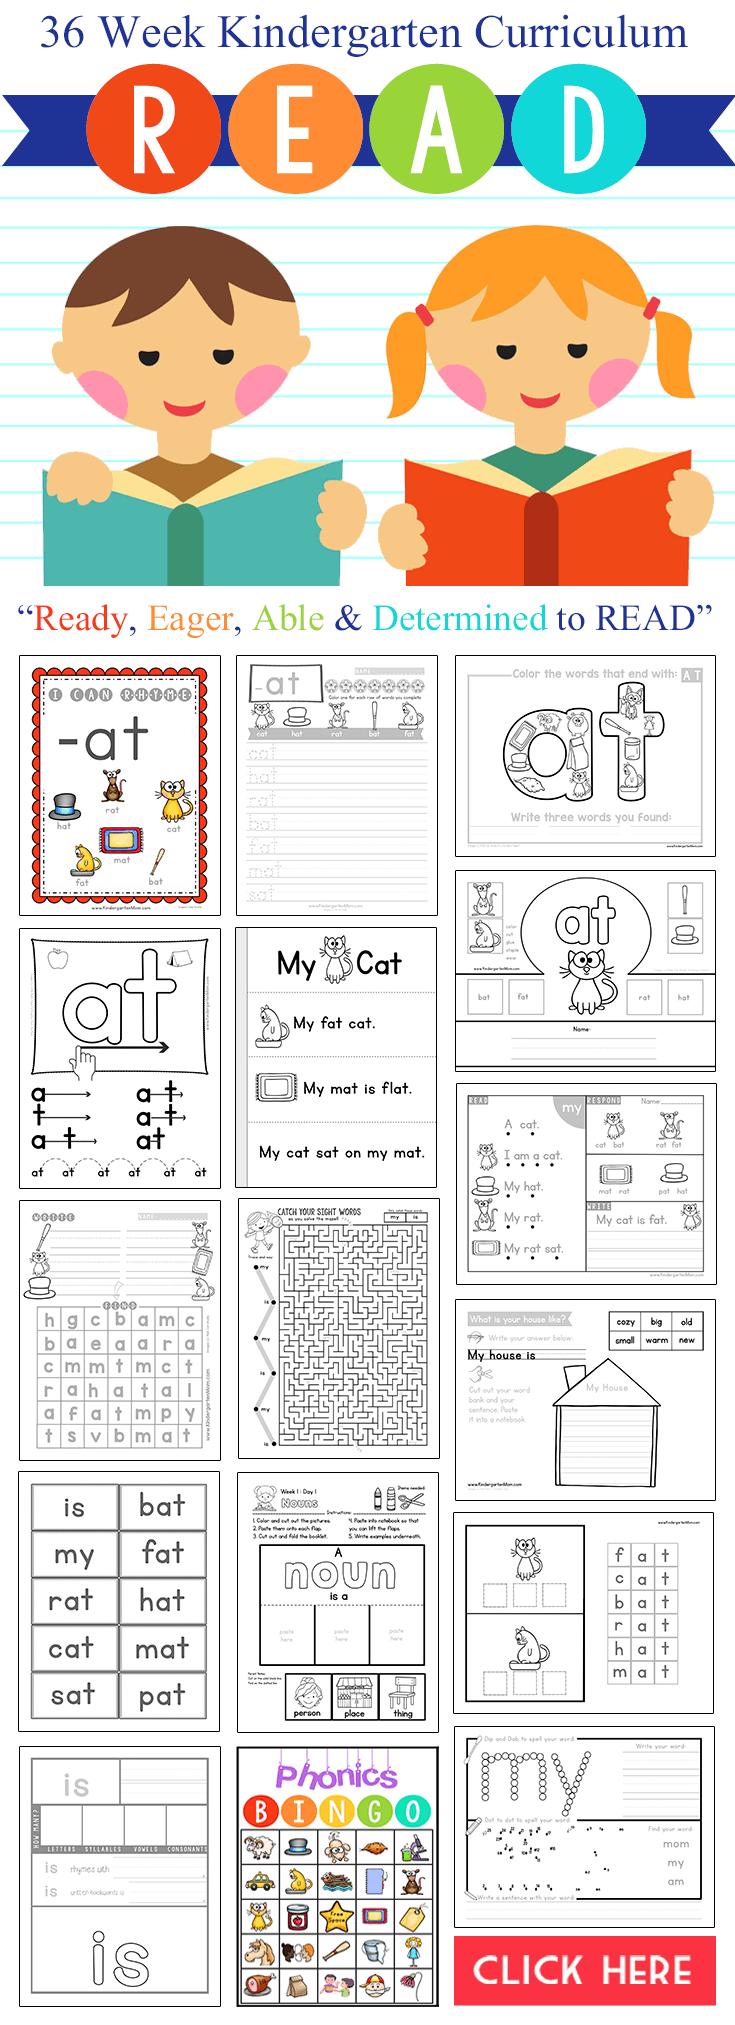 r e a d kindergarten reading curriculum. Black Bedroom Furniture Sets. Home Design Ideas